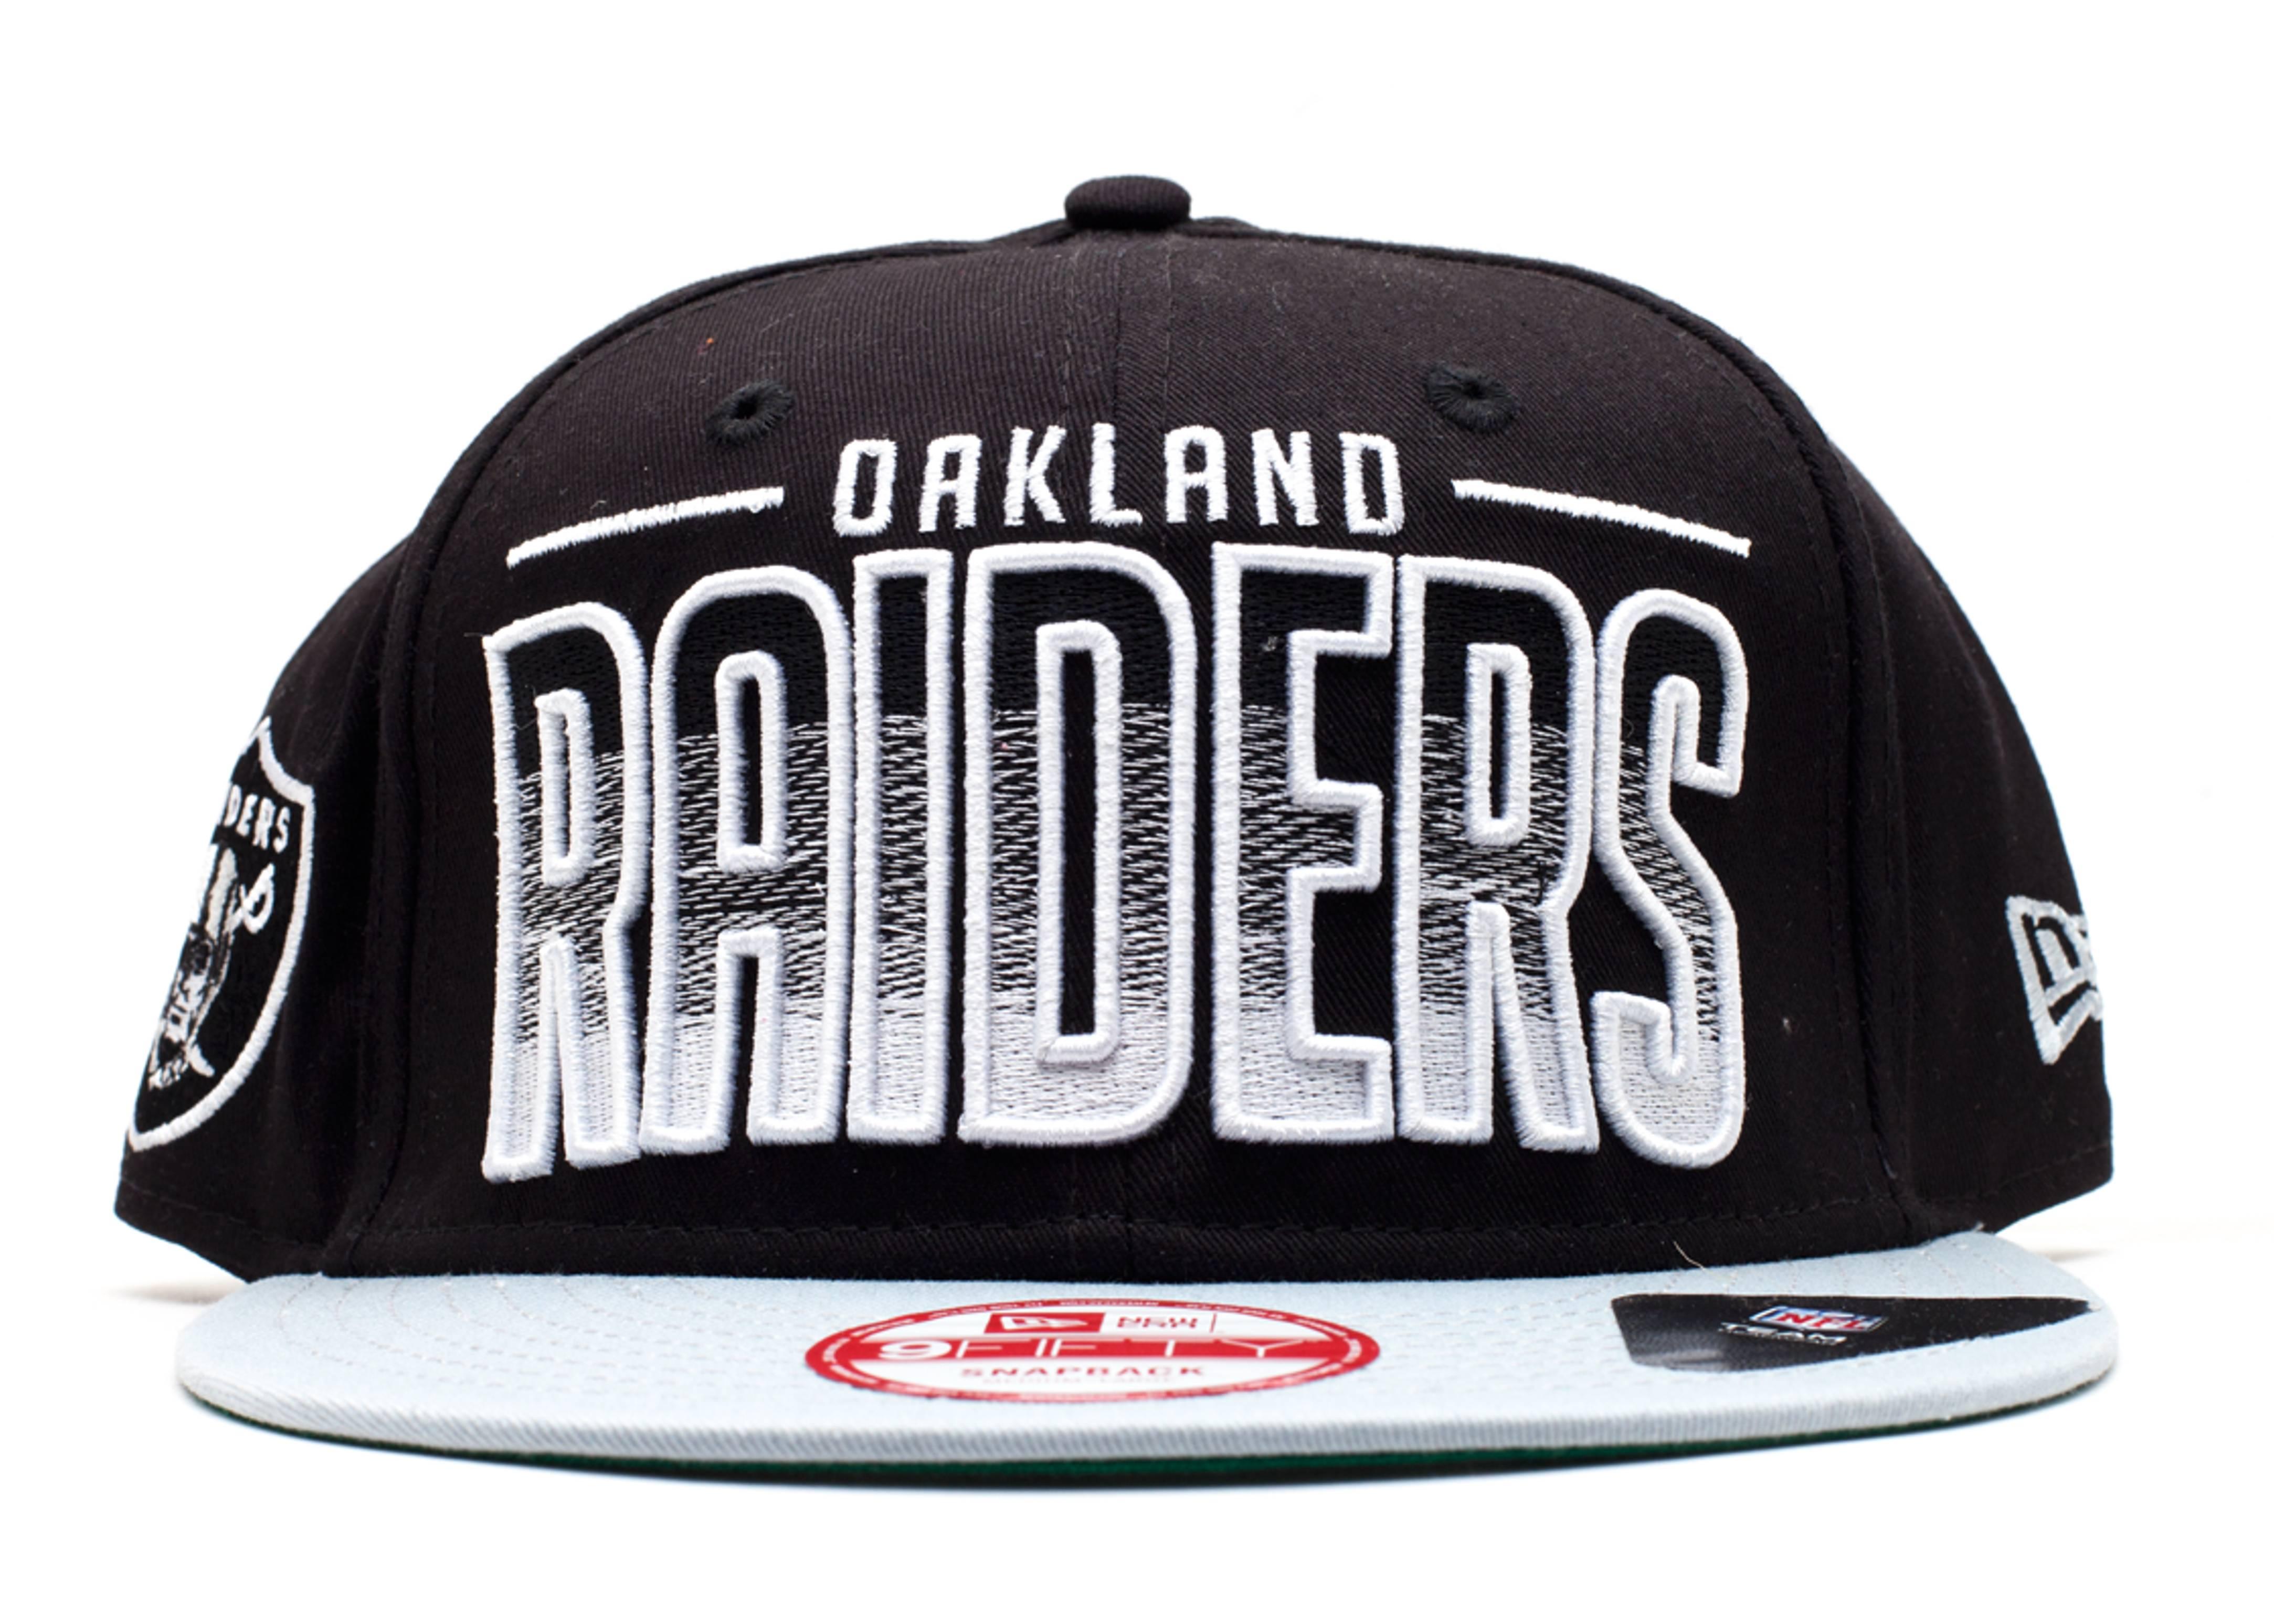 okland raiders snap-back